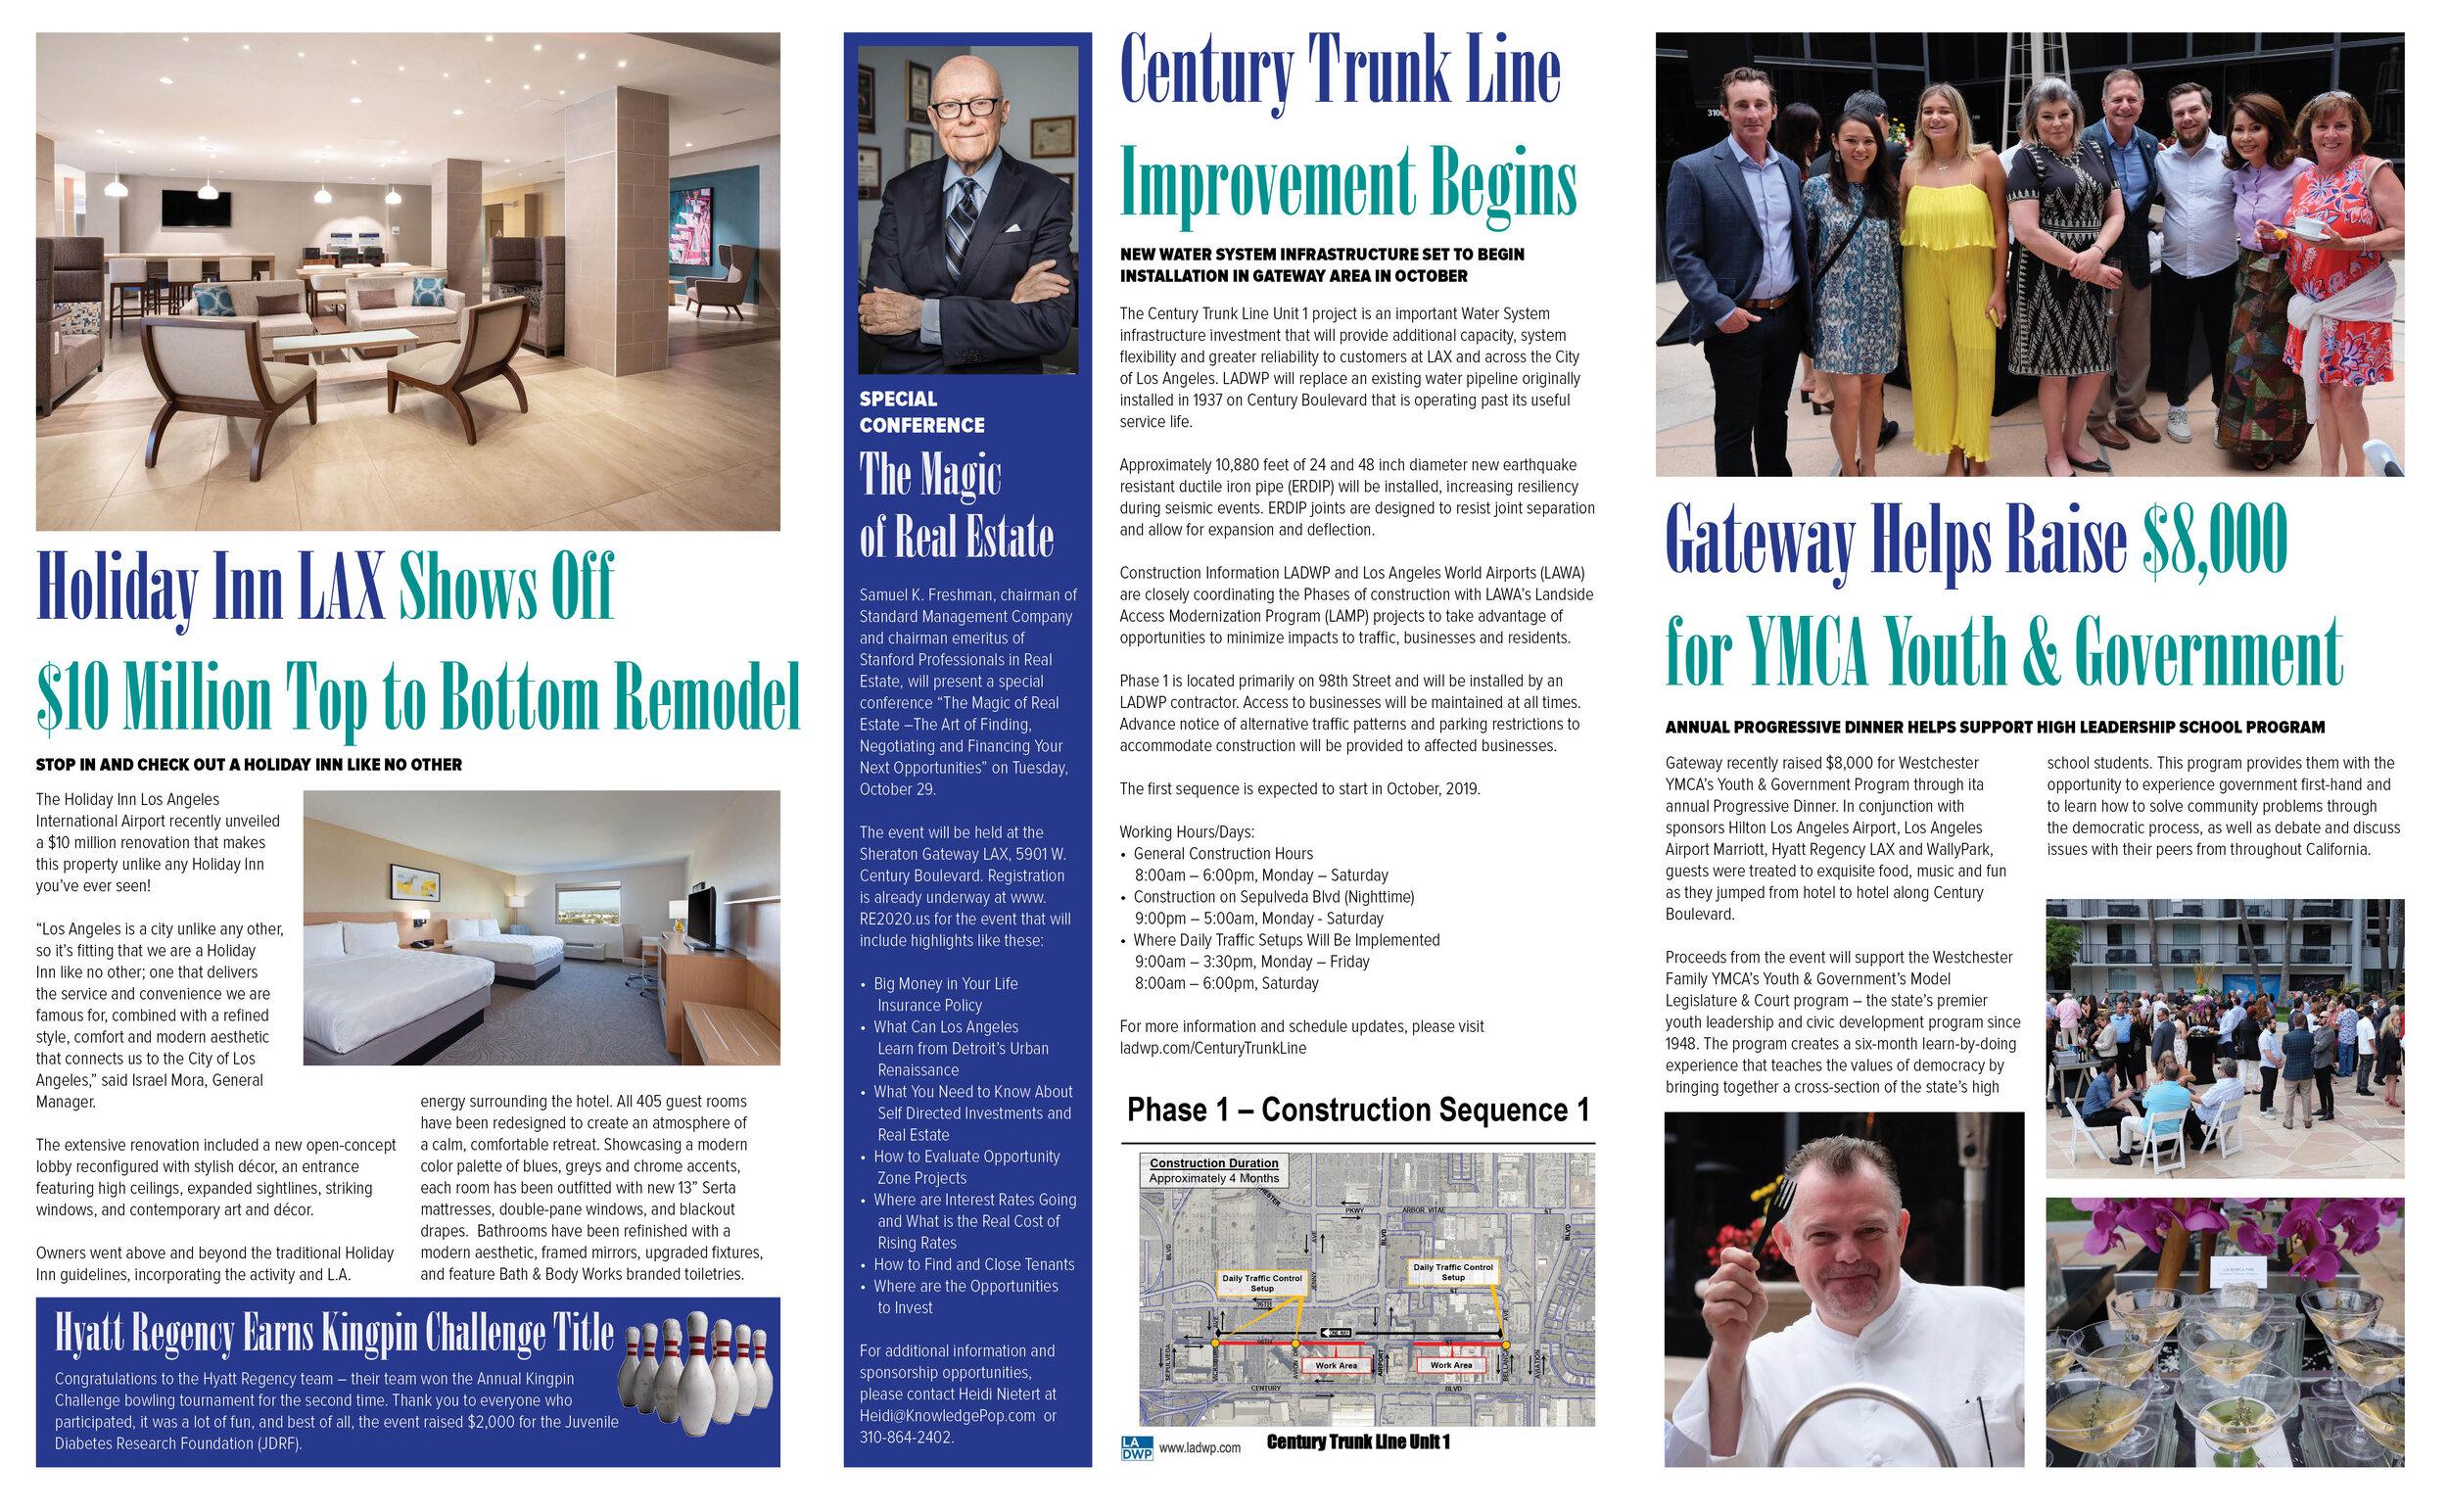 Gateway to L.A. newsletter 09-192.jpg